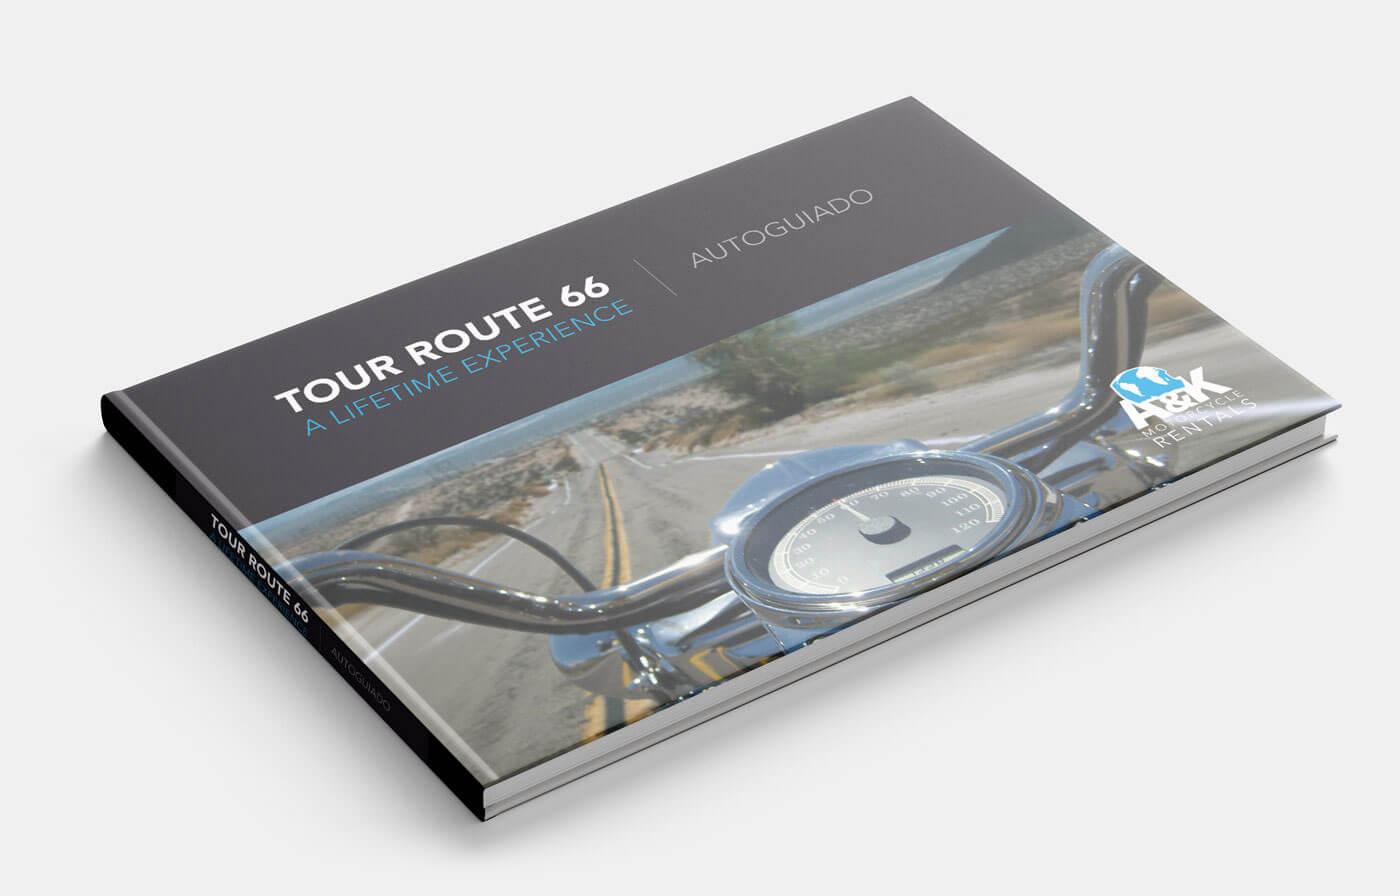 Aek_roadbook-auto66-1